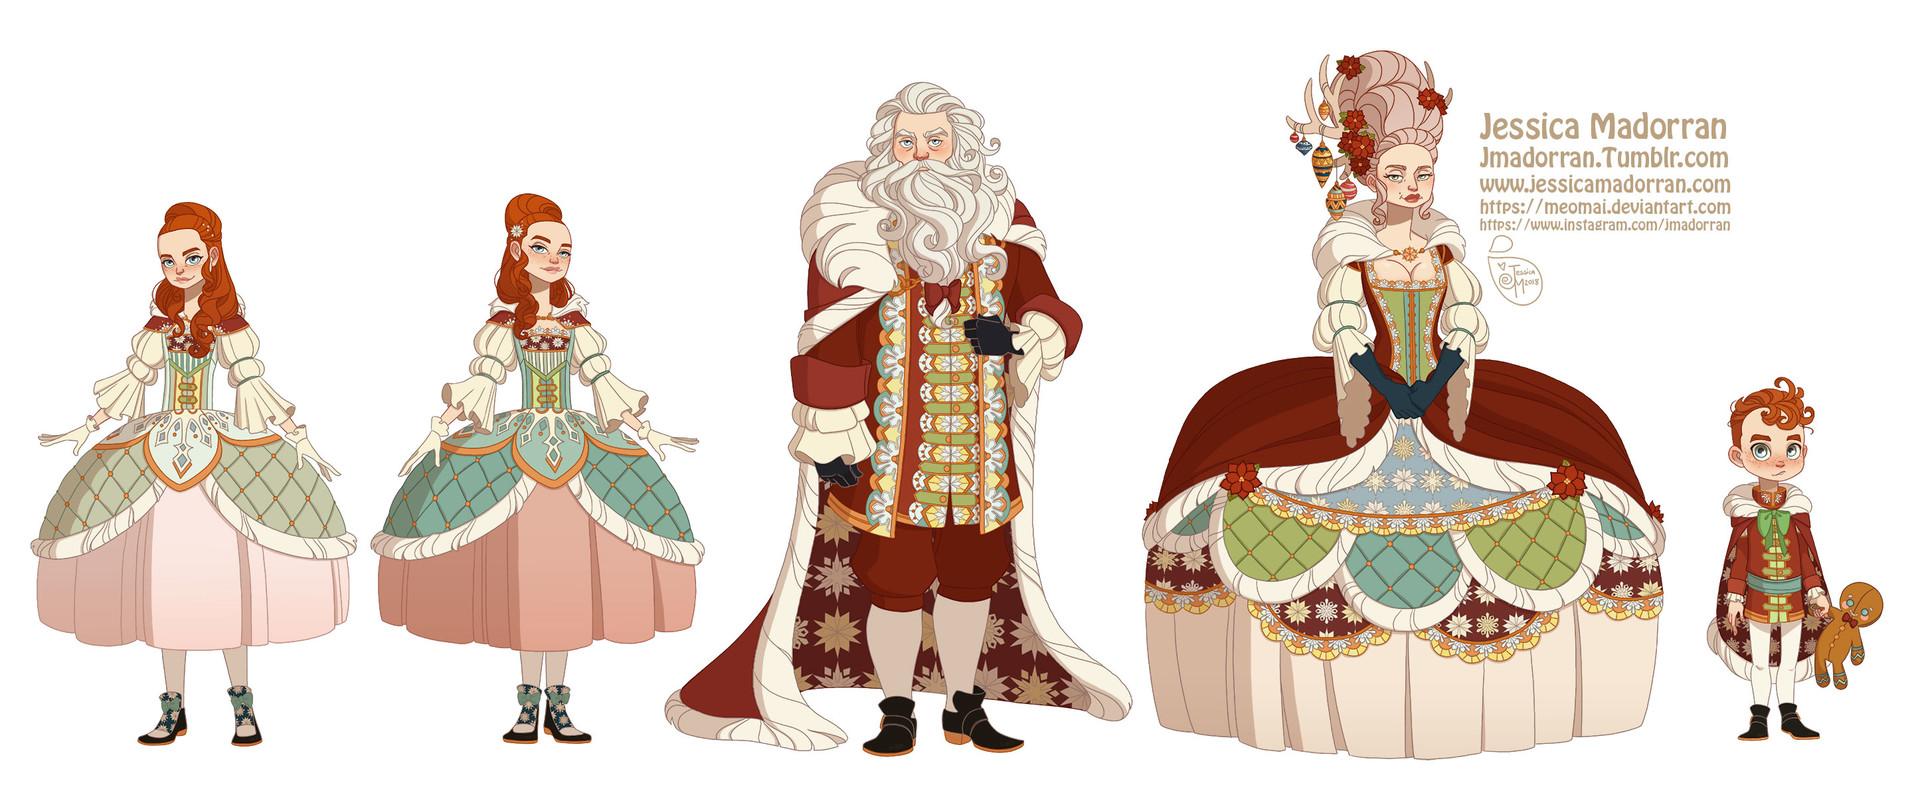 Jessica madorran character design paris 2018 versailles santa family artstation